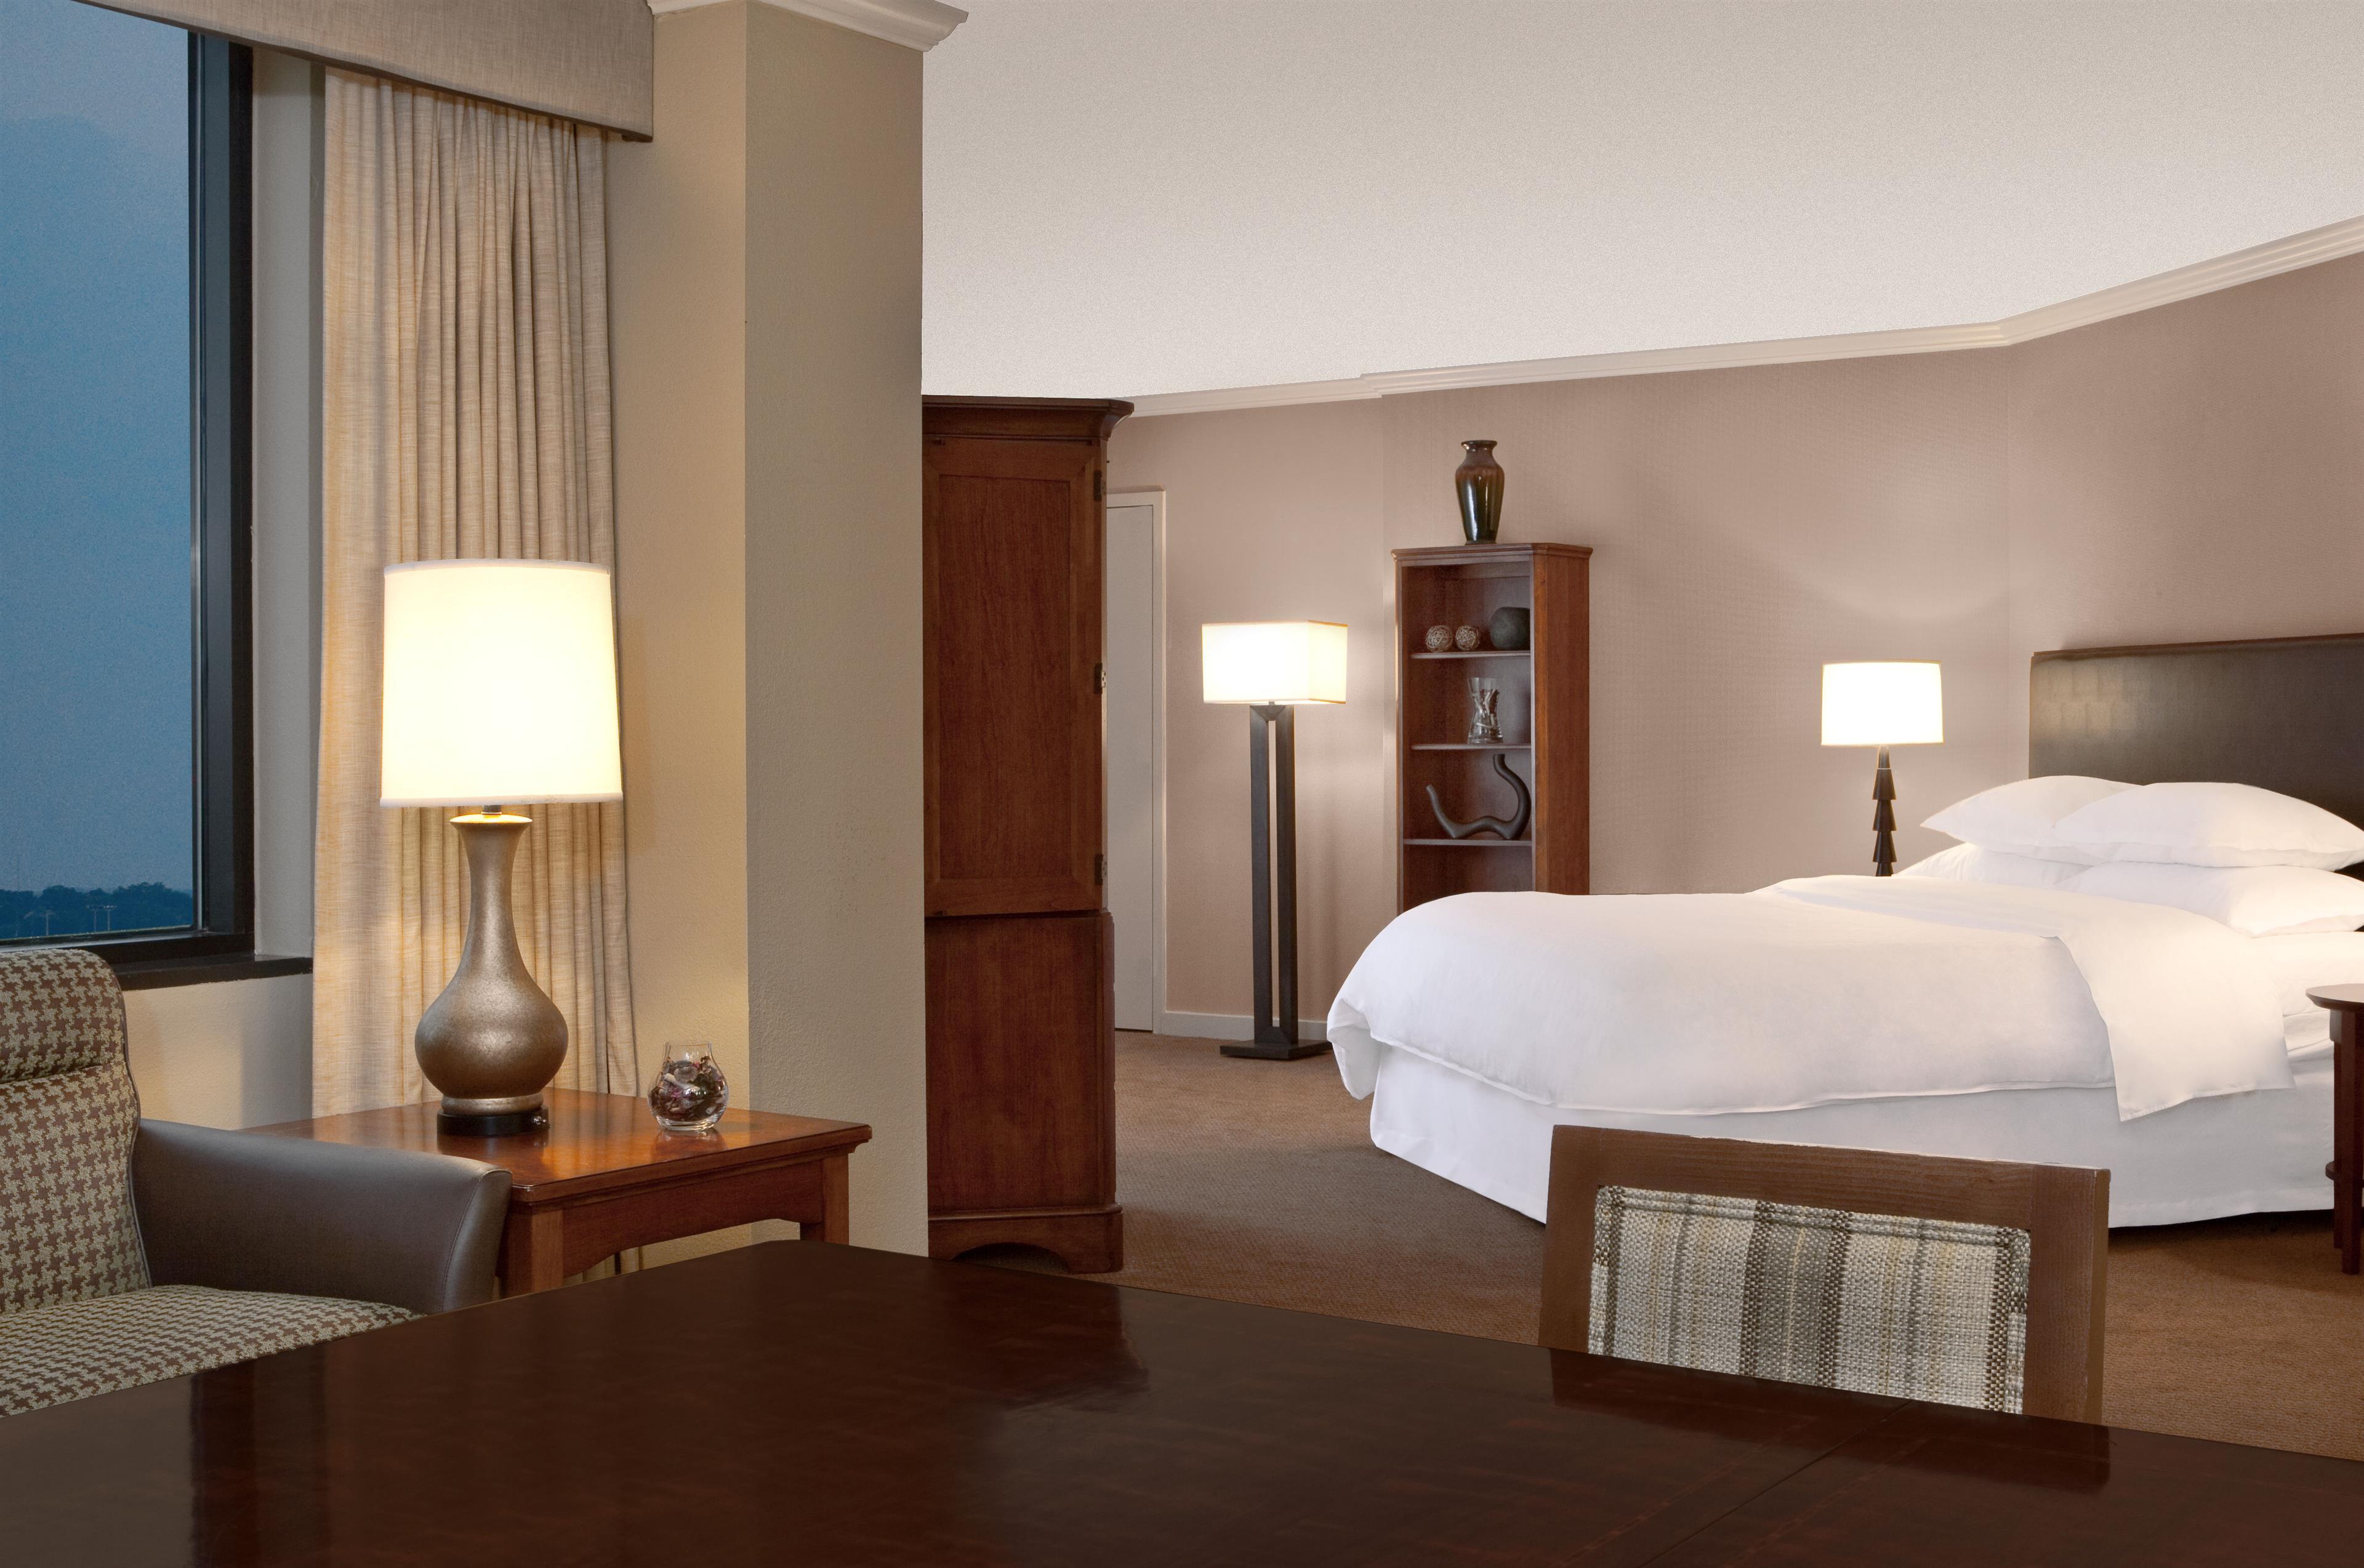 Sheraton Atlanta Airport Hotel image 4